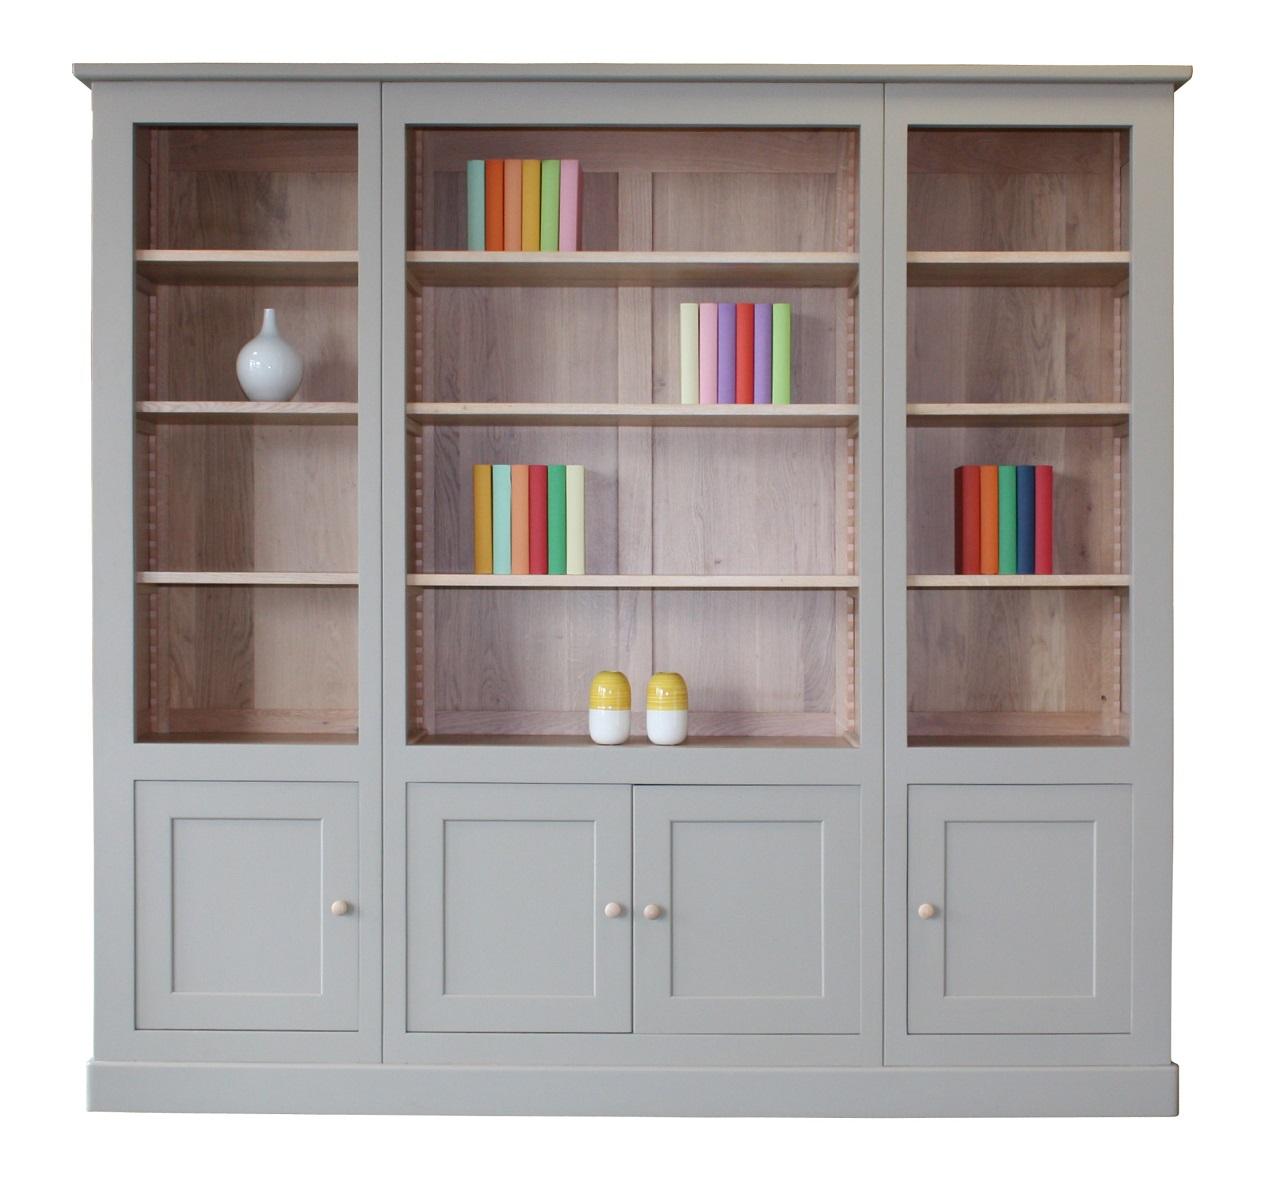 Biblioth que ch ne blanchi et laqu gris - Pirotais meubles ...